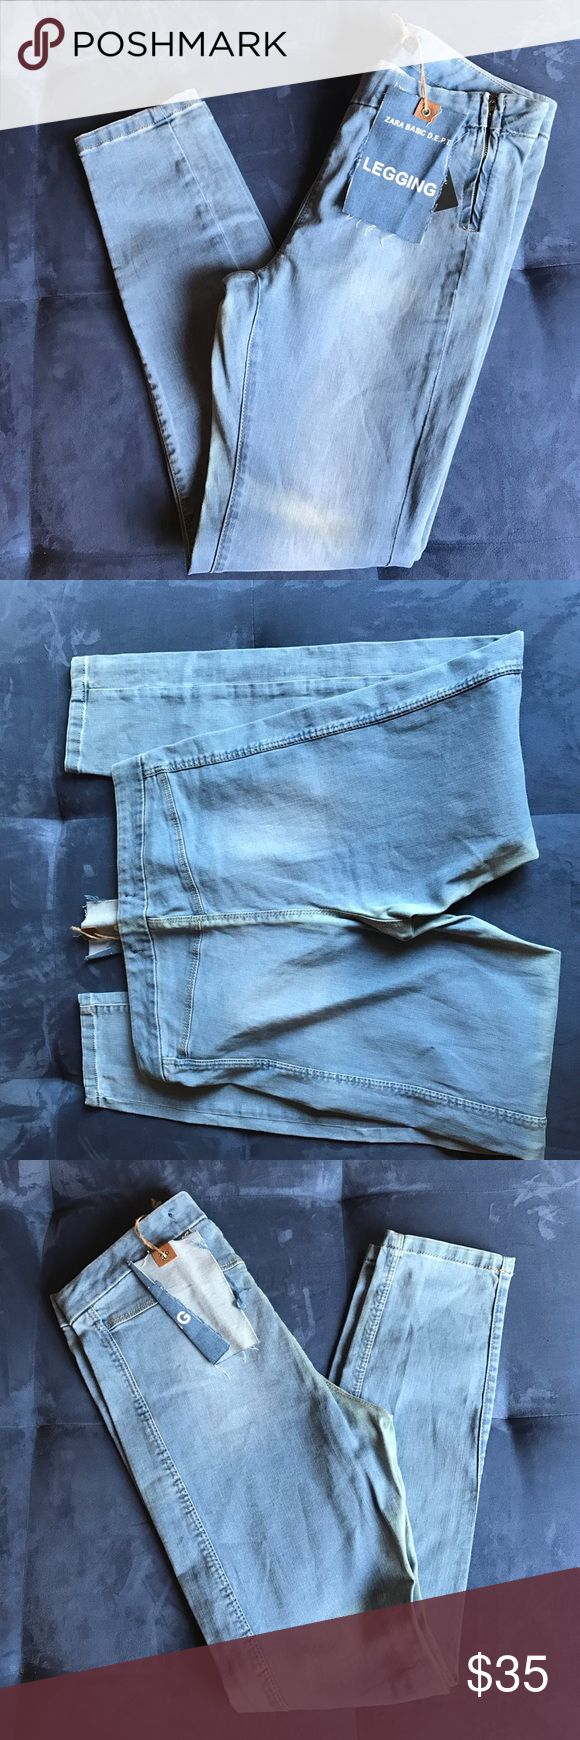 Zara denim legging Blue with a faded detail WAIST 16 across HIPS 17 1/2 LENGHT 38 1/2 Zara Pants Leggings